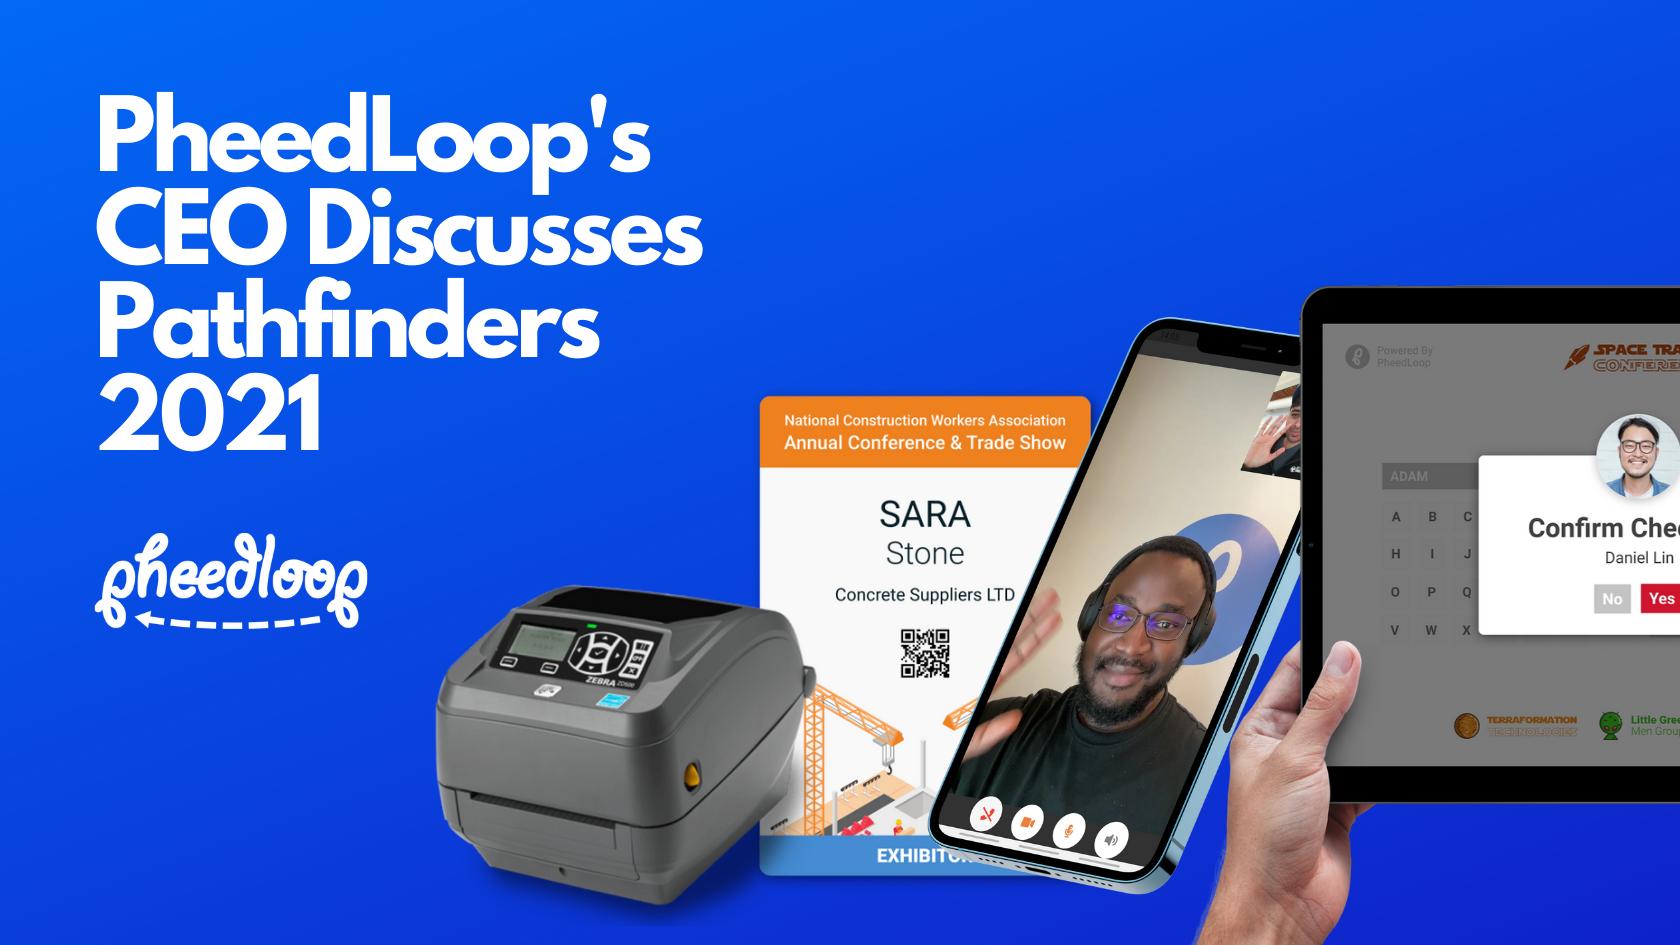 PheedLoop's CEO Discusses Pathfinders 2021 + Post-Event Product Updates!